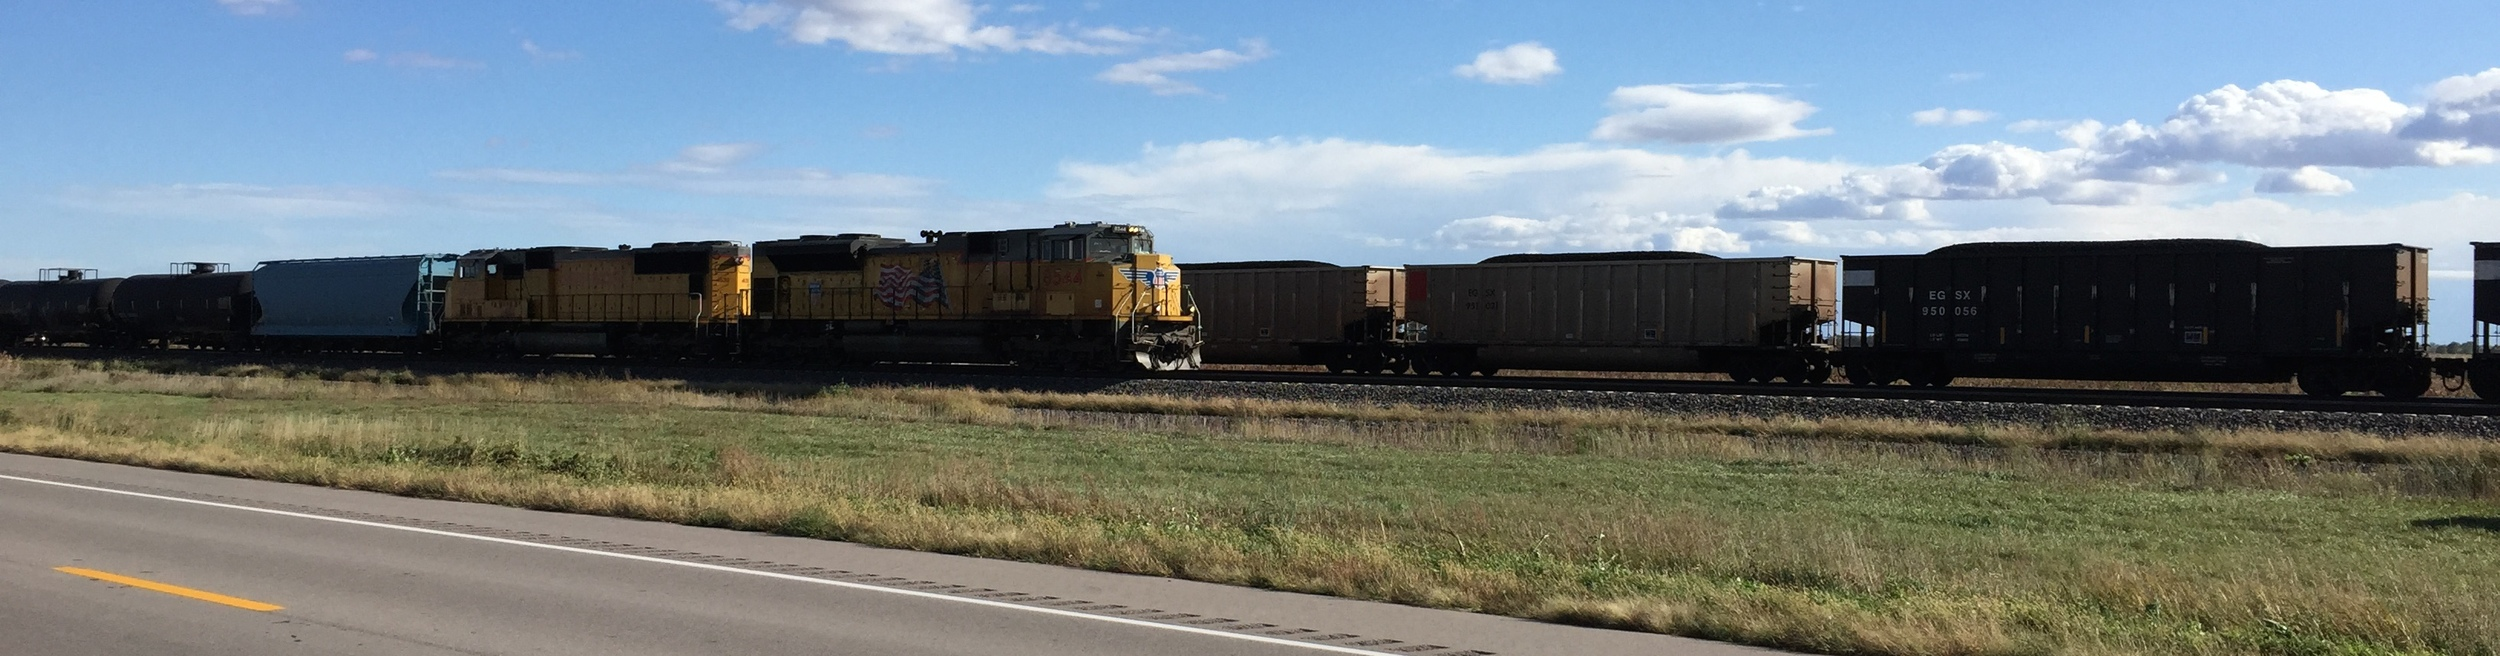 Trains Crossing